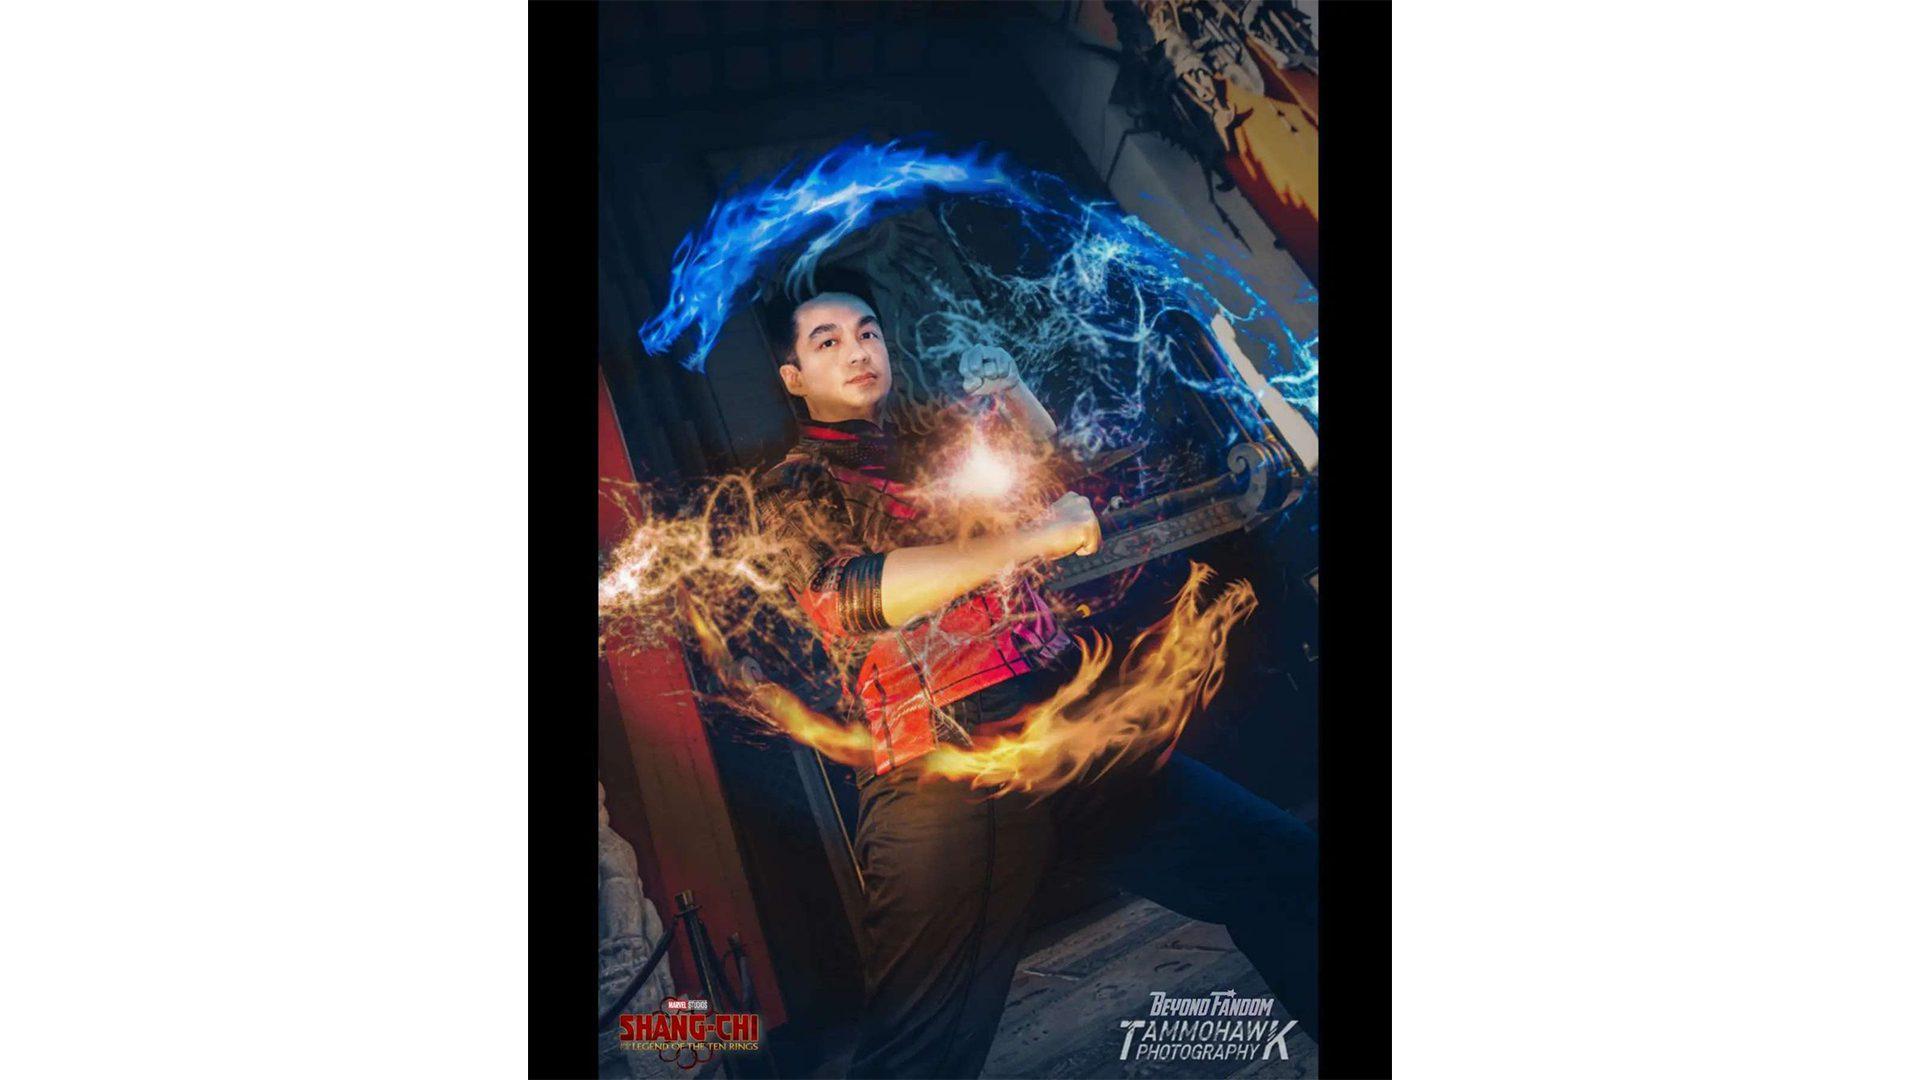 Shang-Chi cosplay by Sam Chan